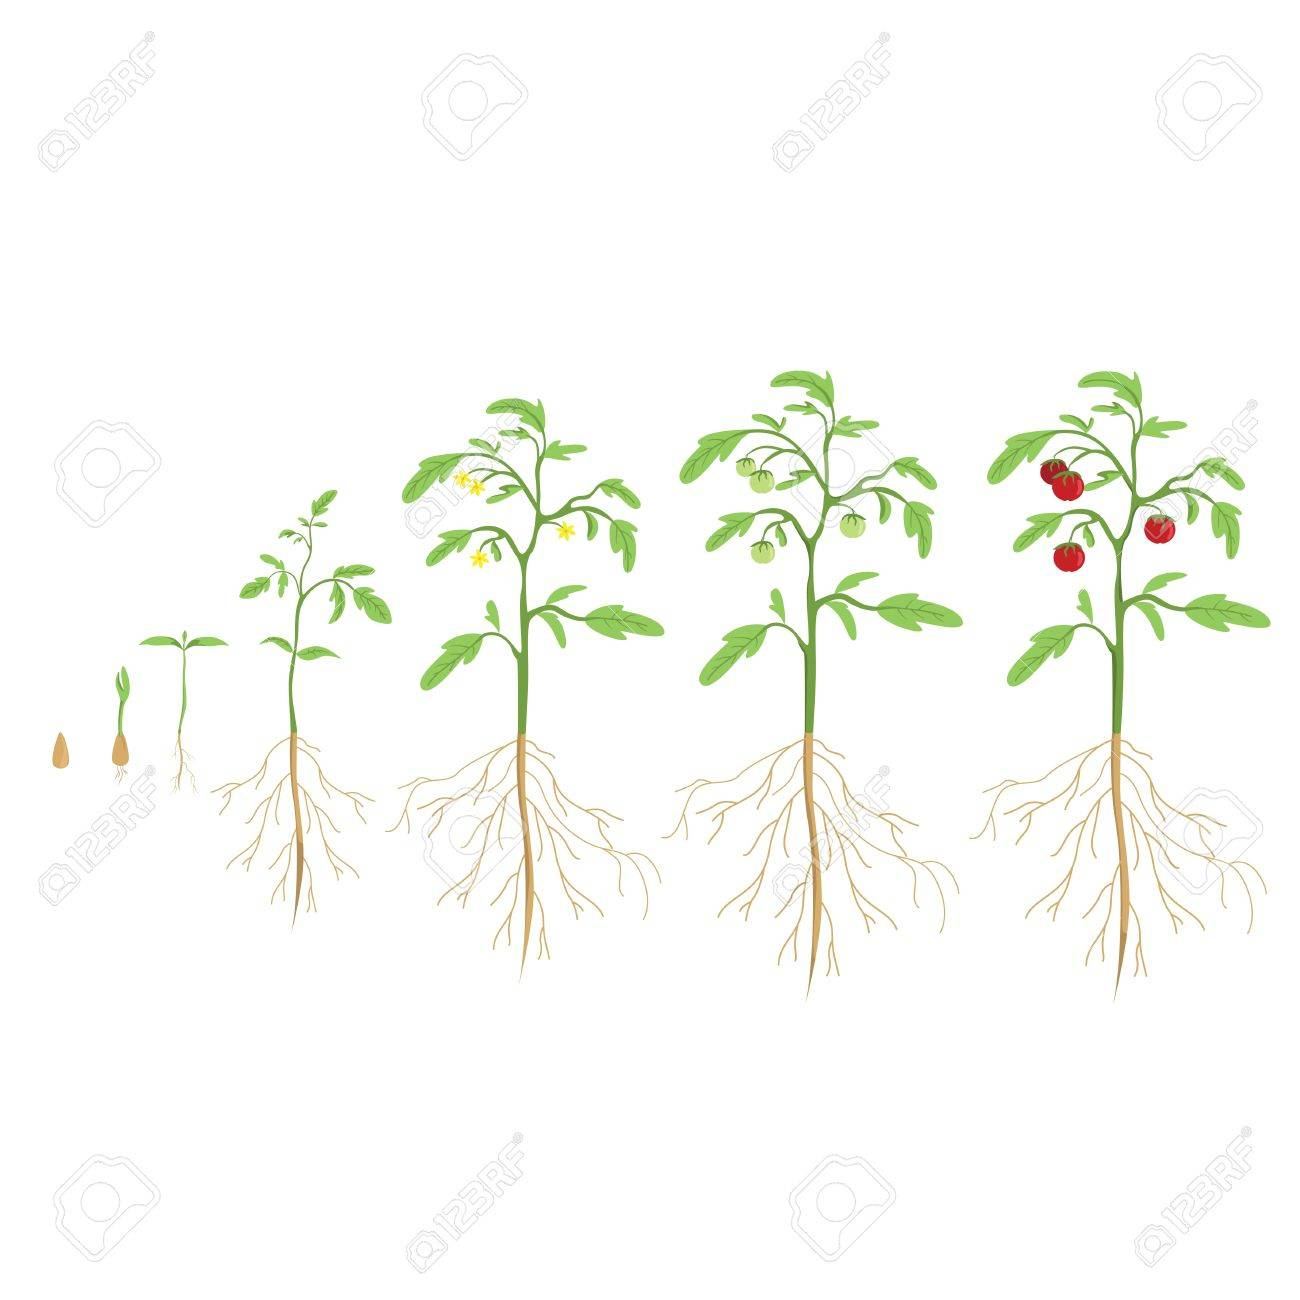 Tomato plant cycle. Growth progress. - 67061058